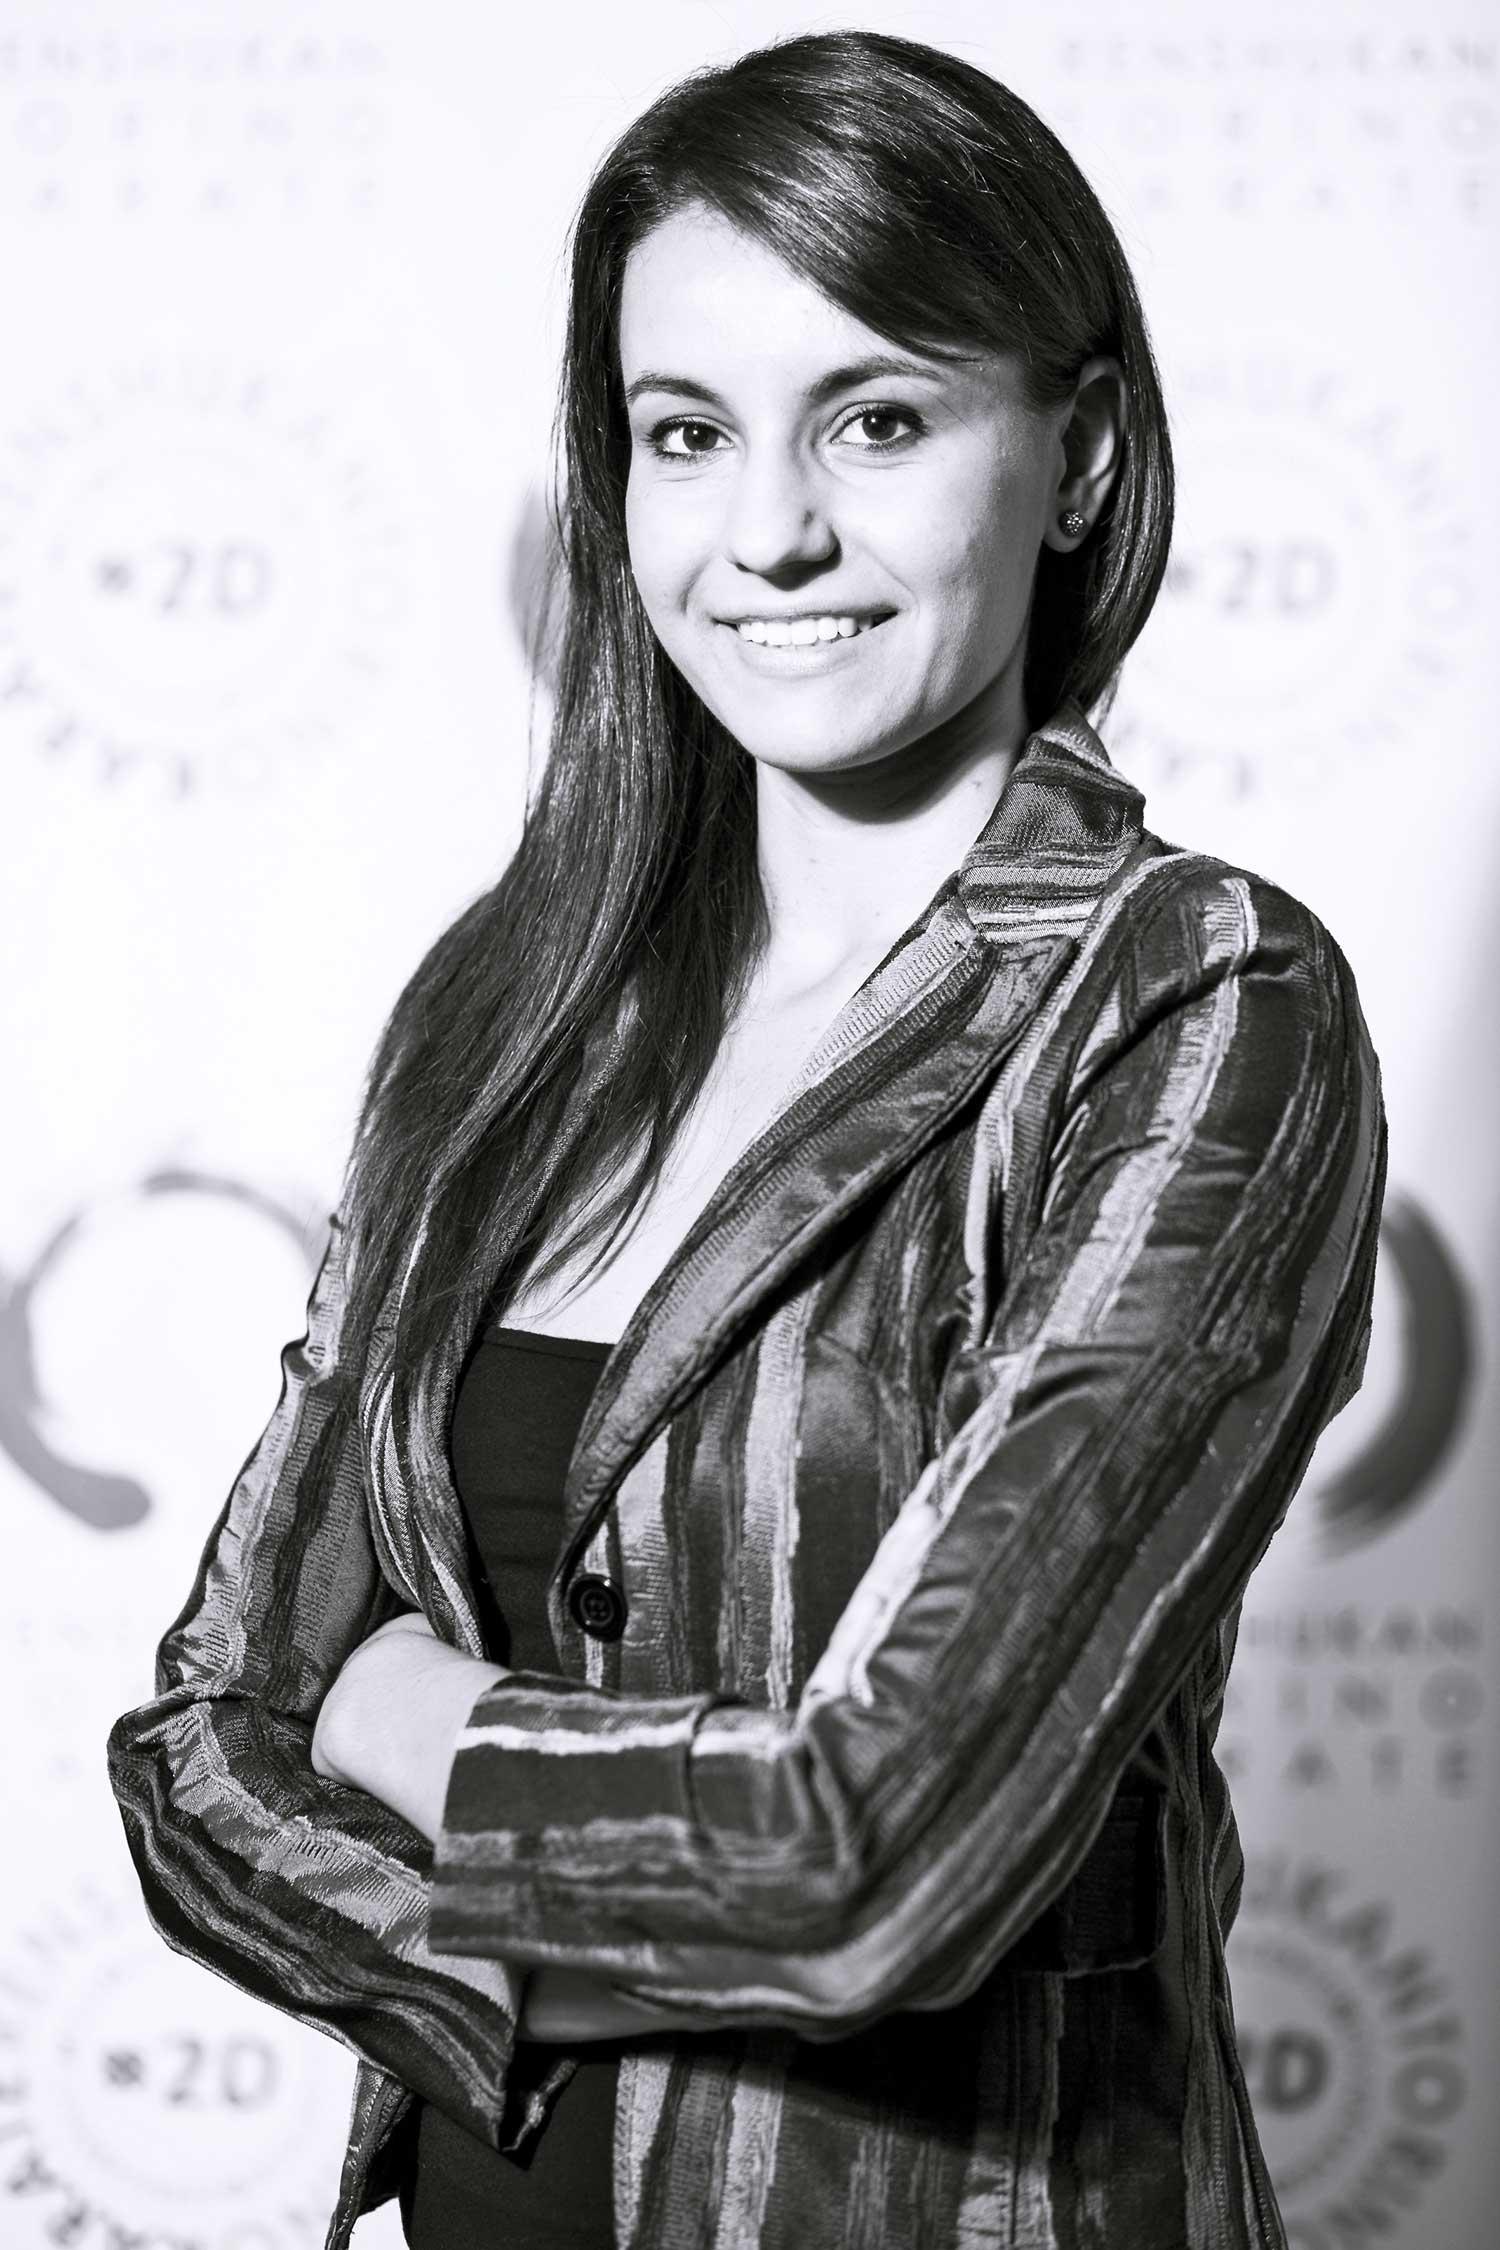 Maria Chiara Gurrado